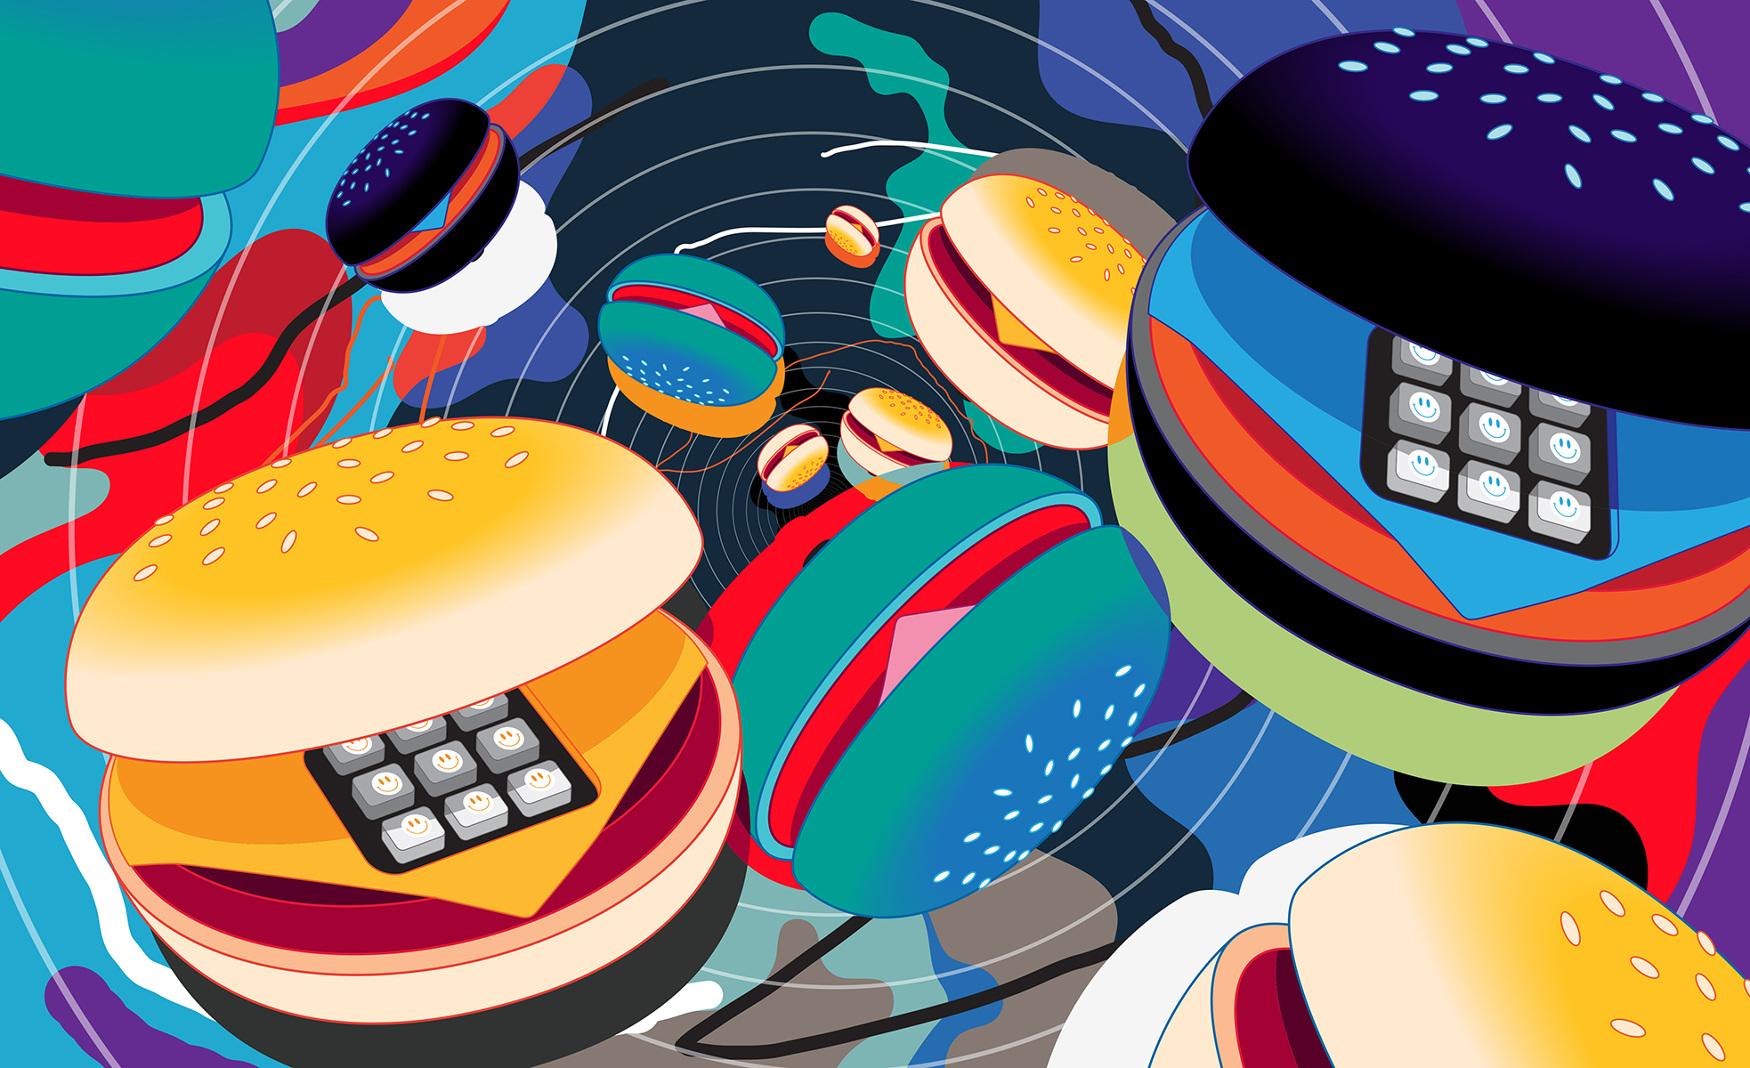 Burger Phones